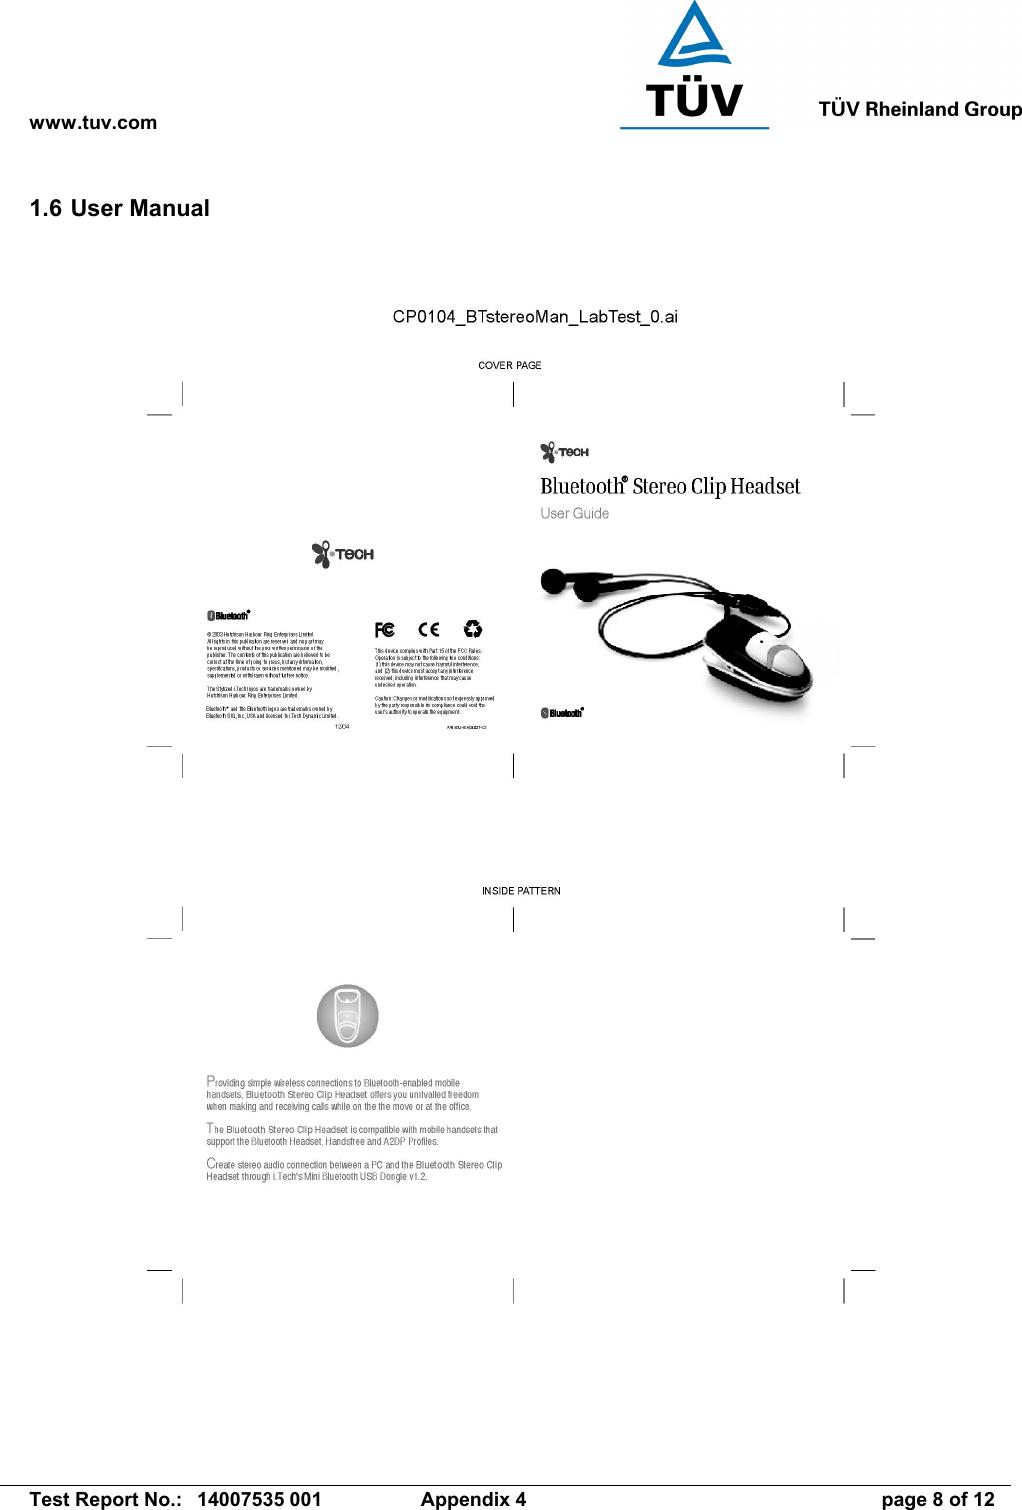 i tech dynamic c51 a04027 xx bluetooth stereo clip headset user rh usermanual wiki ACS Technical Manual Tech Review Manual